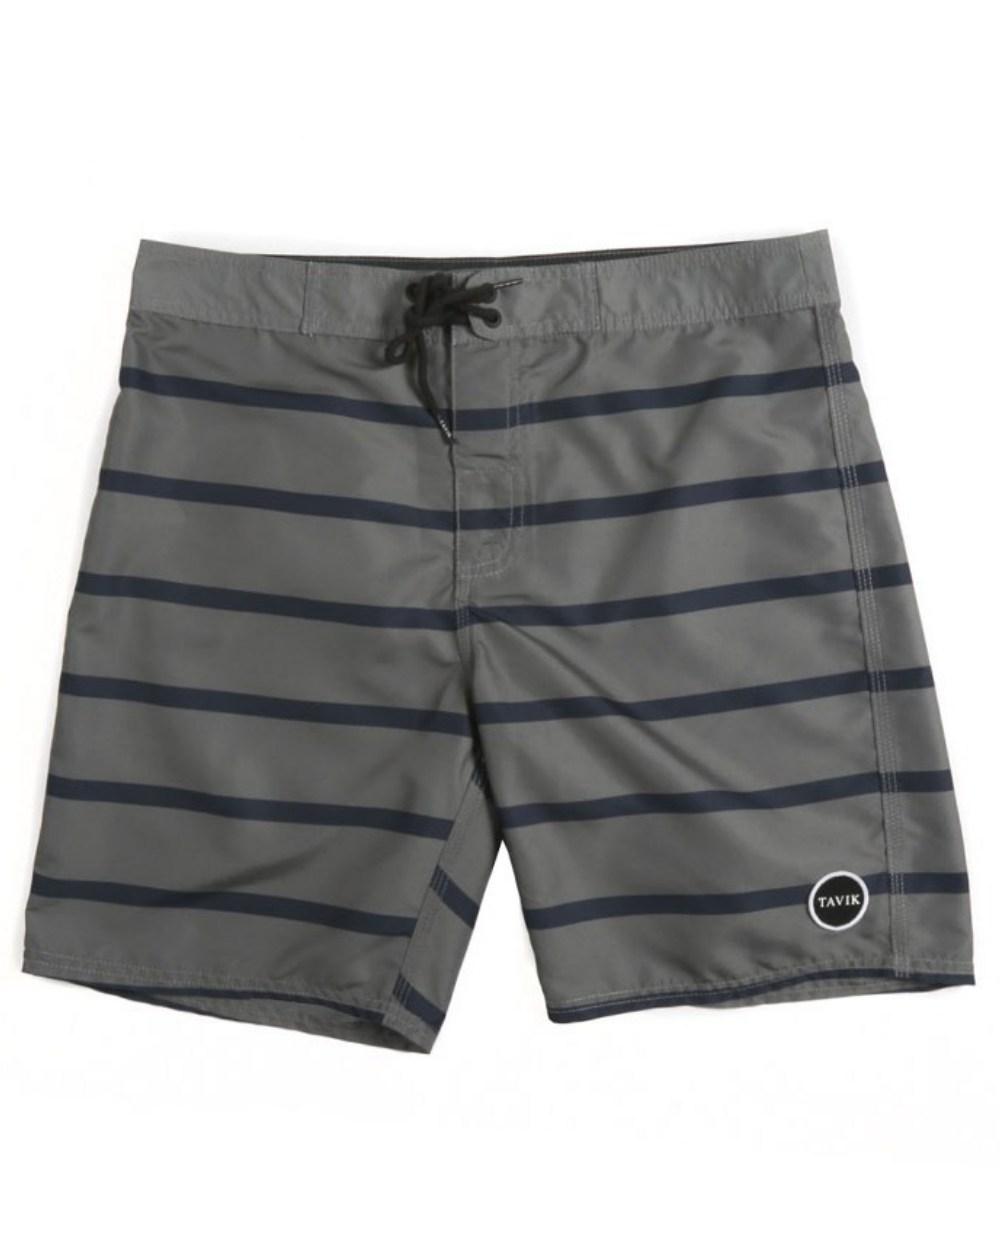 2015 Tavik Men's Gray Capital Boardshort - Front